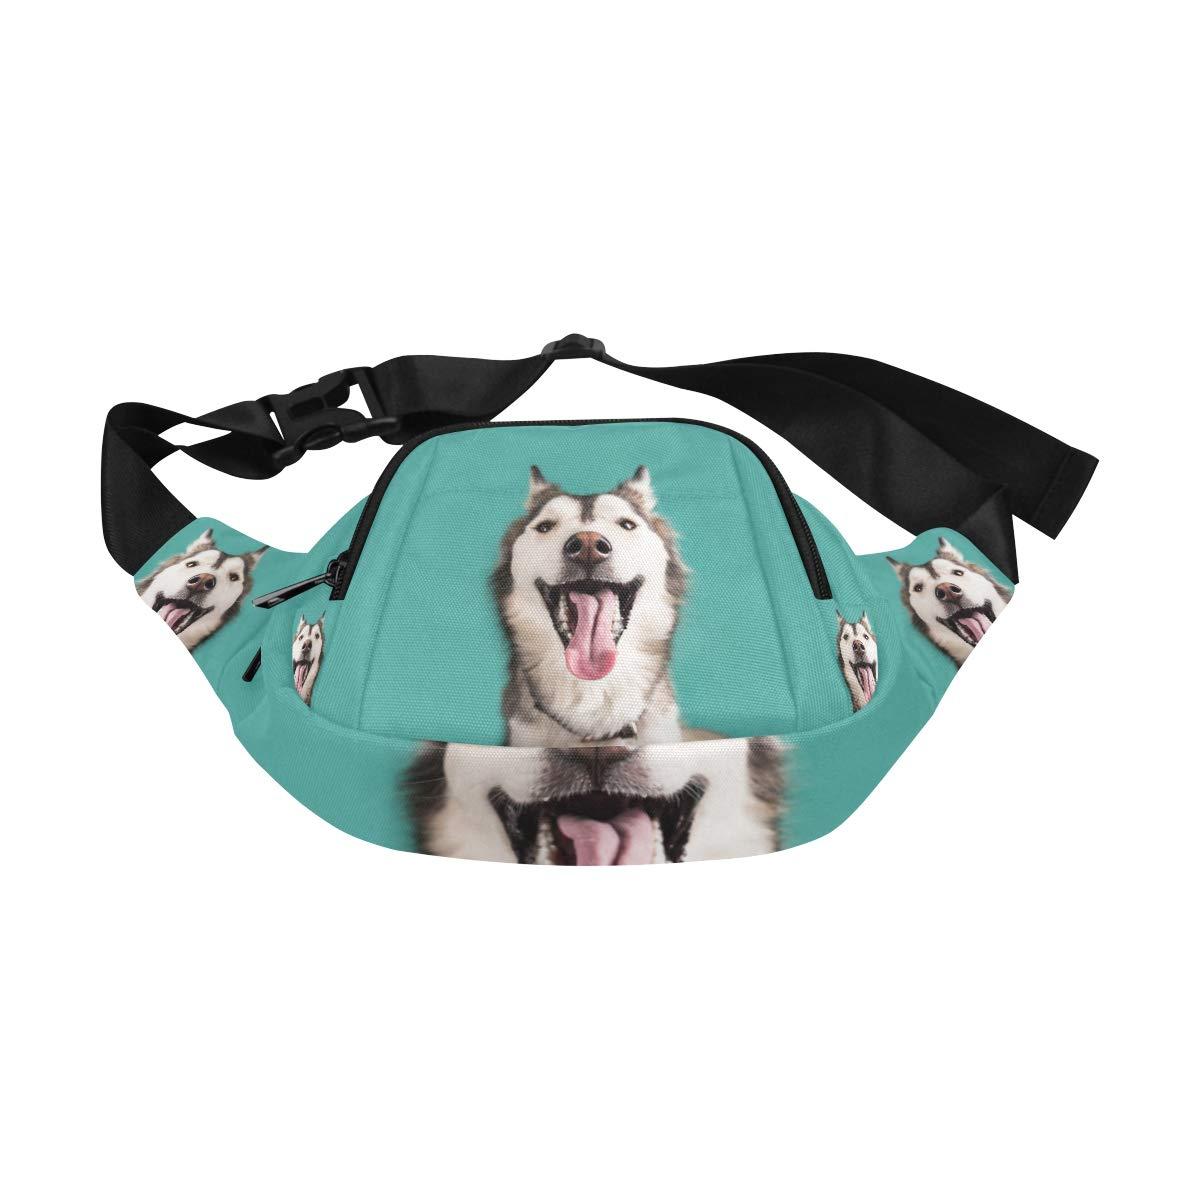 Funny Close-up Siberian Husky Fenny Packs Waist Bags Adjustable Belt Waterproof Nylon Travel Running Sport Vacation Party For Men Women Boys Girls Kids